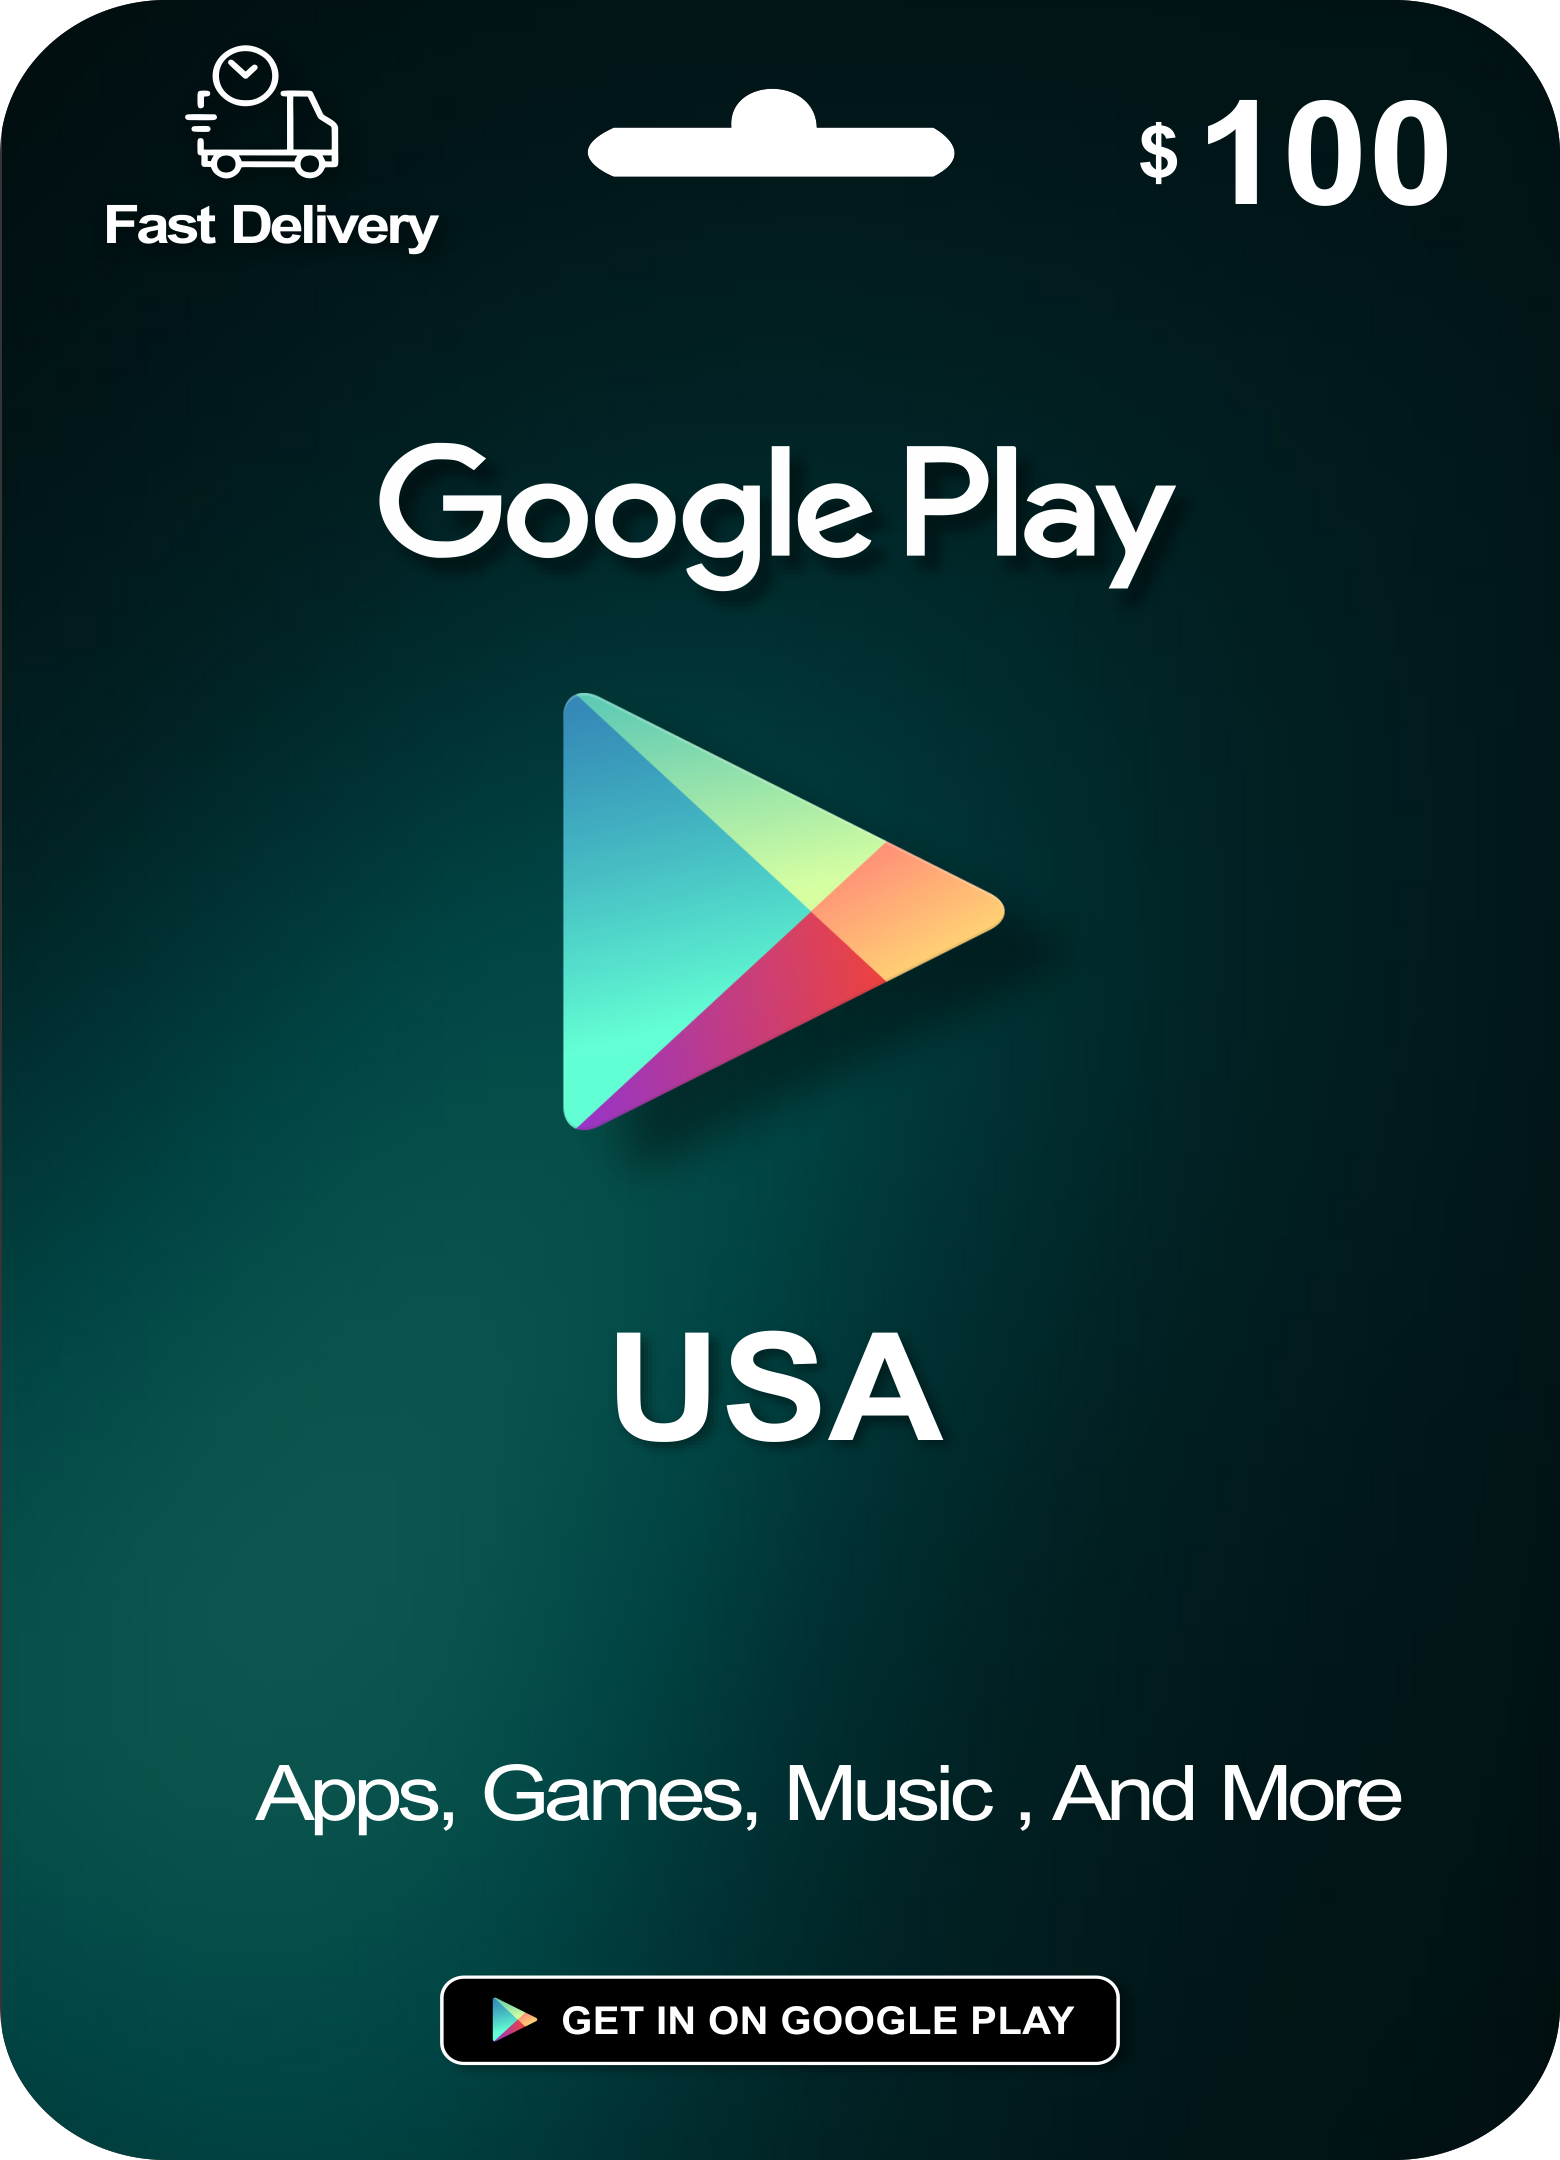 Google Play Gift Card 100 Usd United States Google Play Gift Card Mcdonalds Gift Card Ikea Gift Card